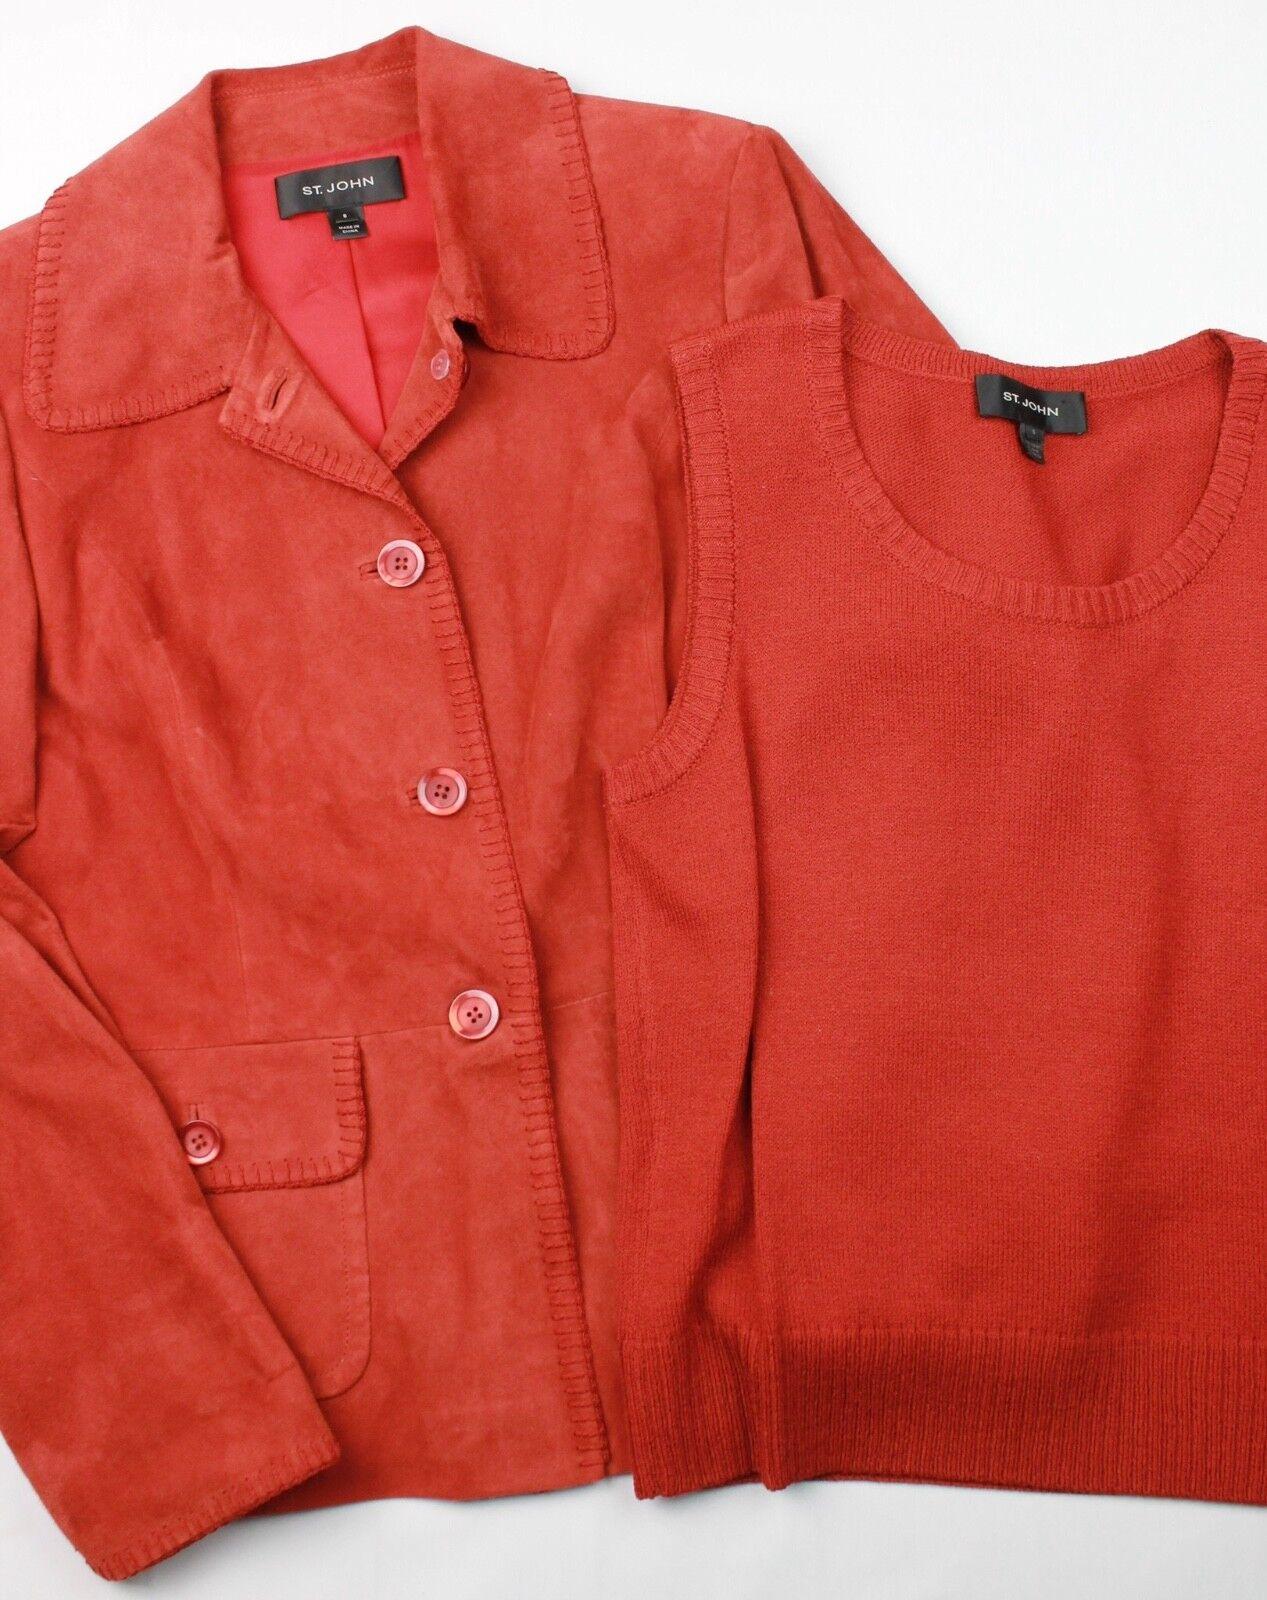 St. John Caviar Collection Rust orange orange orange Goat Suede Blazer Santana Knit Set 8 S 804a53